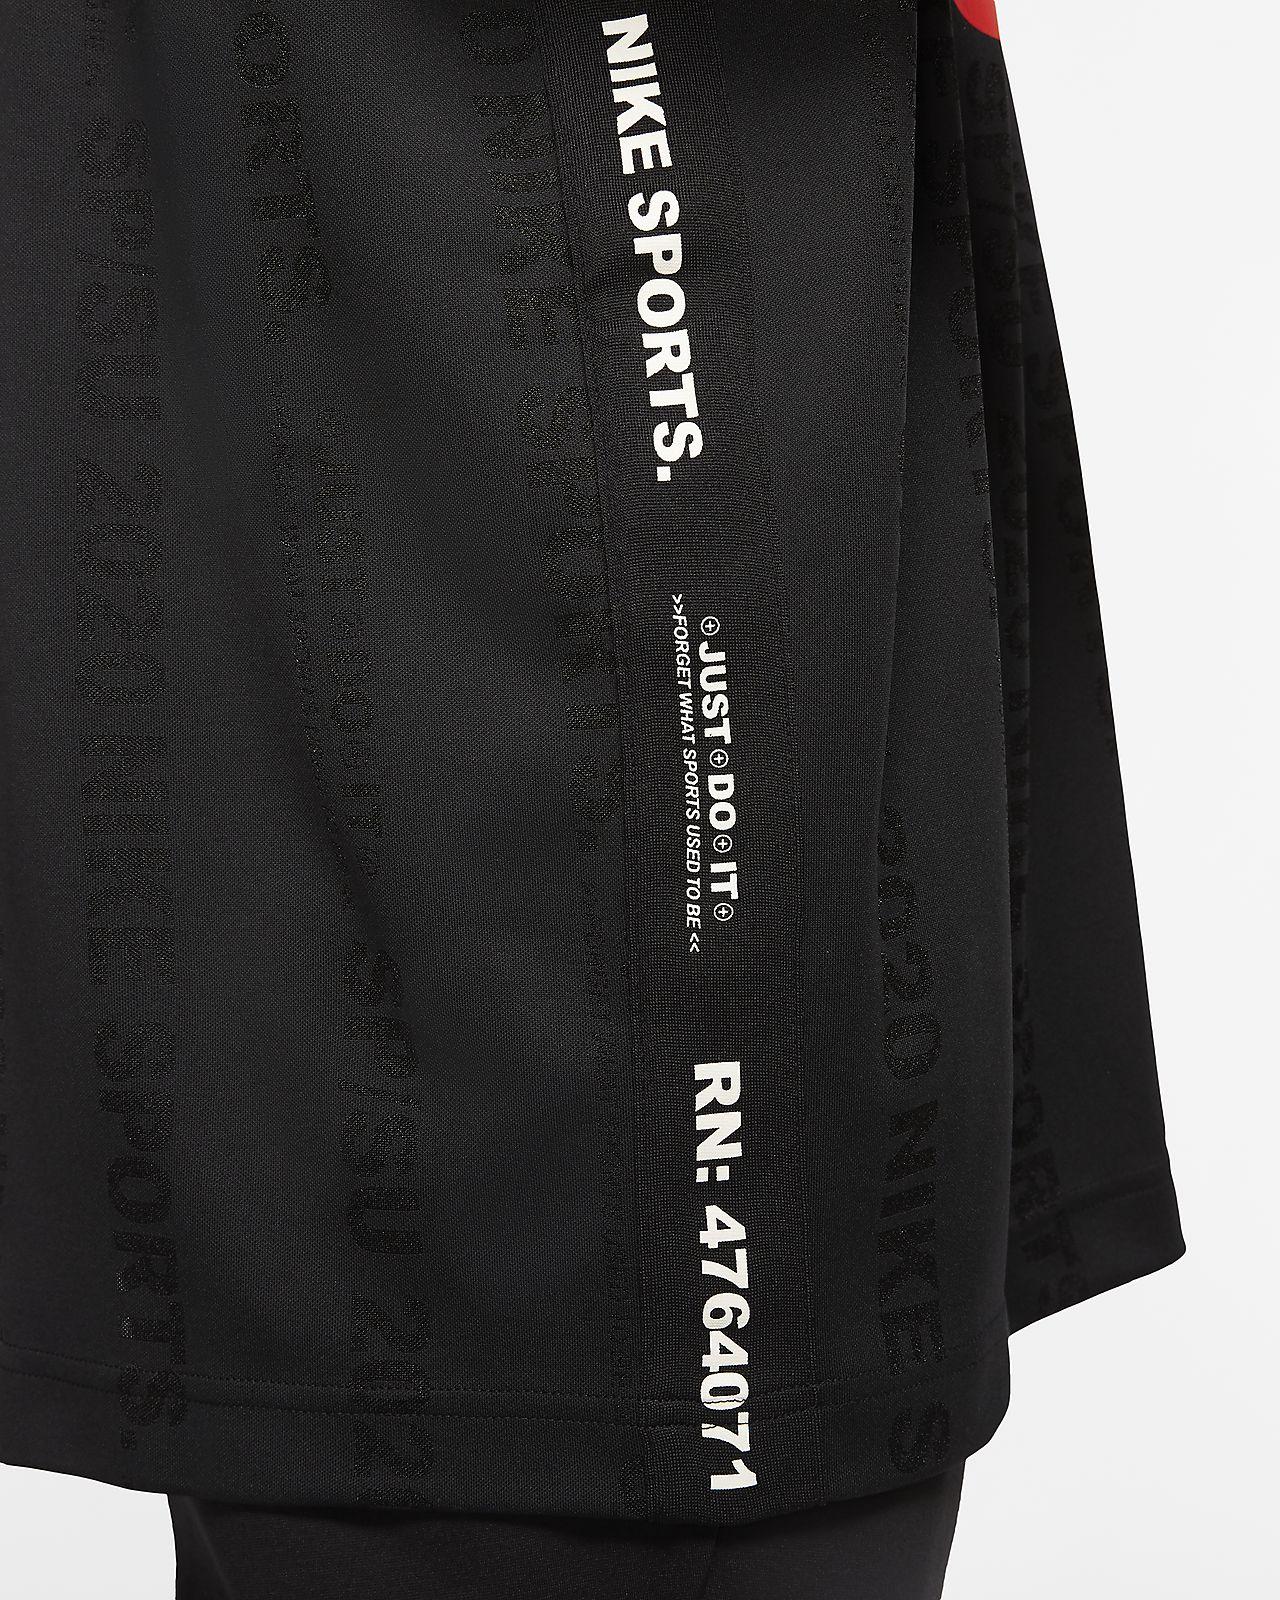 NIKE ACG Tee Black Orange Back Sportswear NikeLab Size XL NSW We Out There